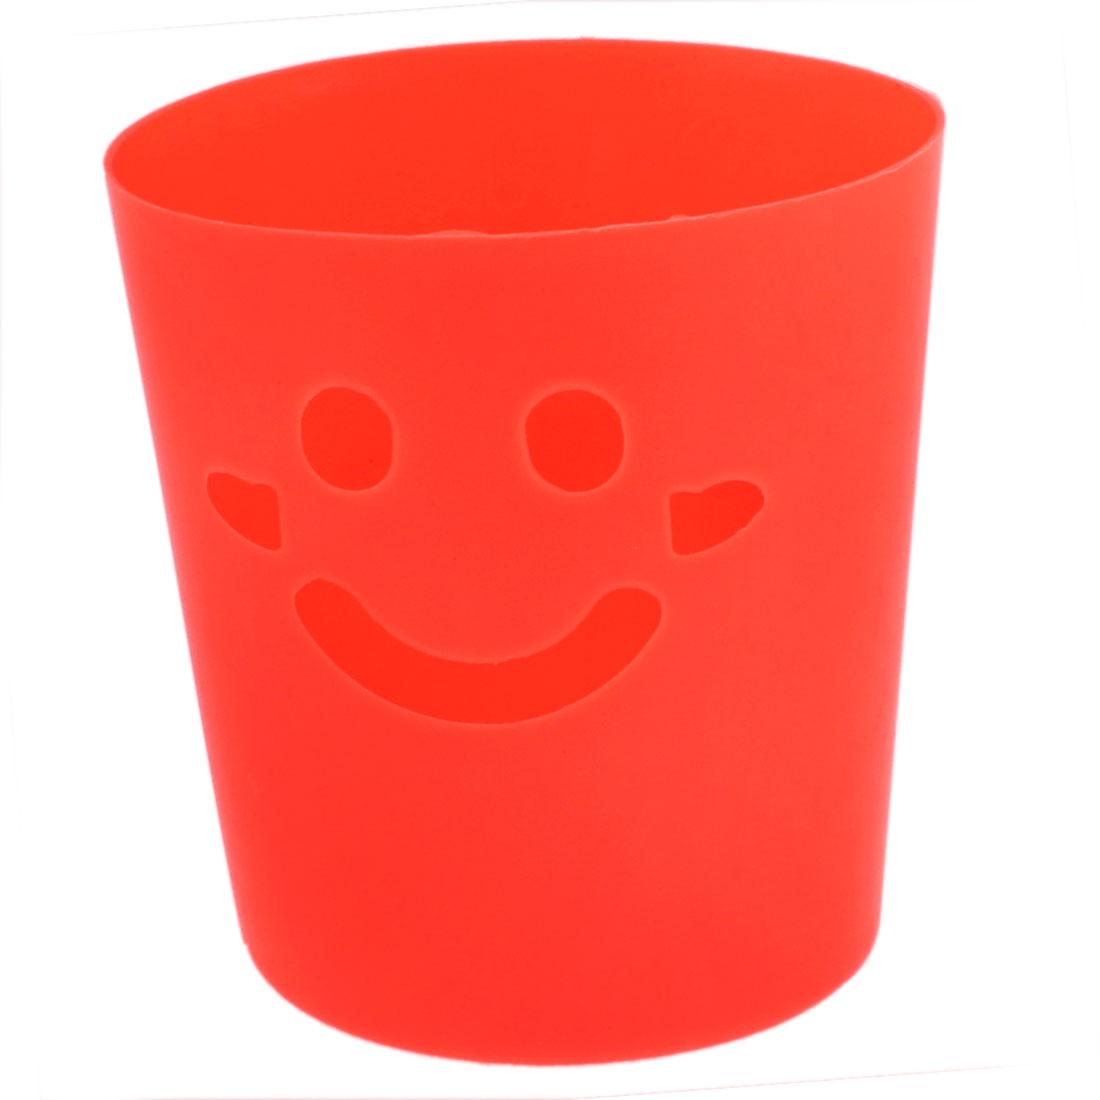 Plastic Smiling Face Design Mini Litter Trash Can Storage Bucket Orange Red